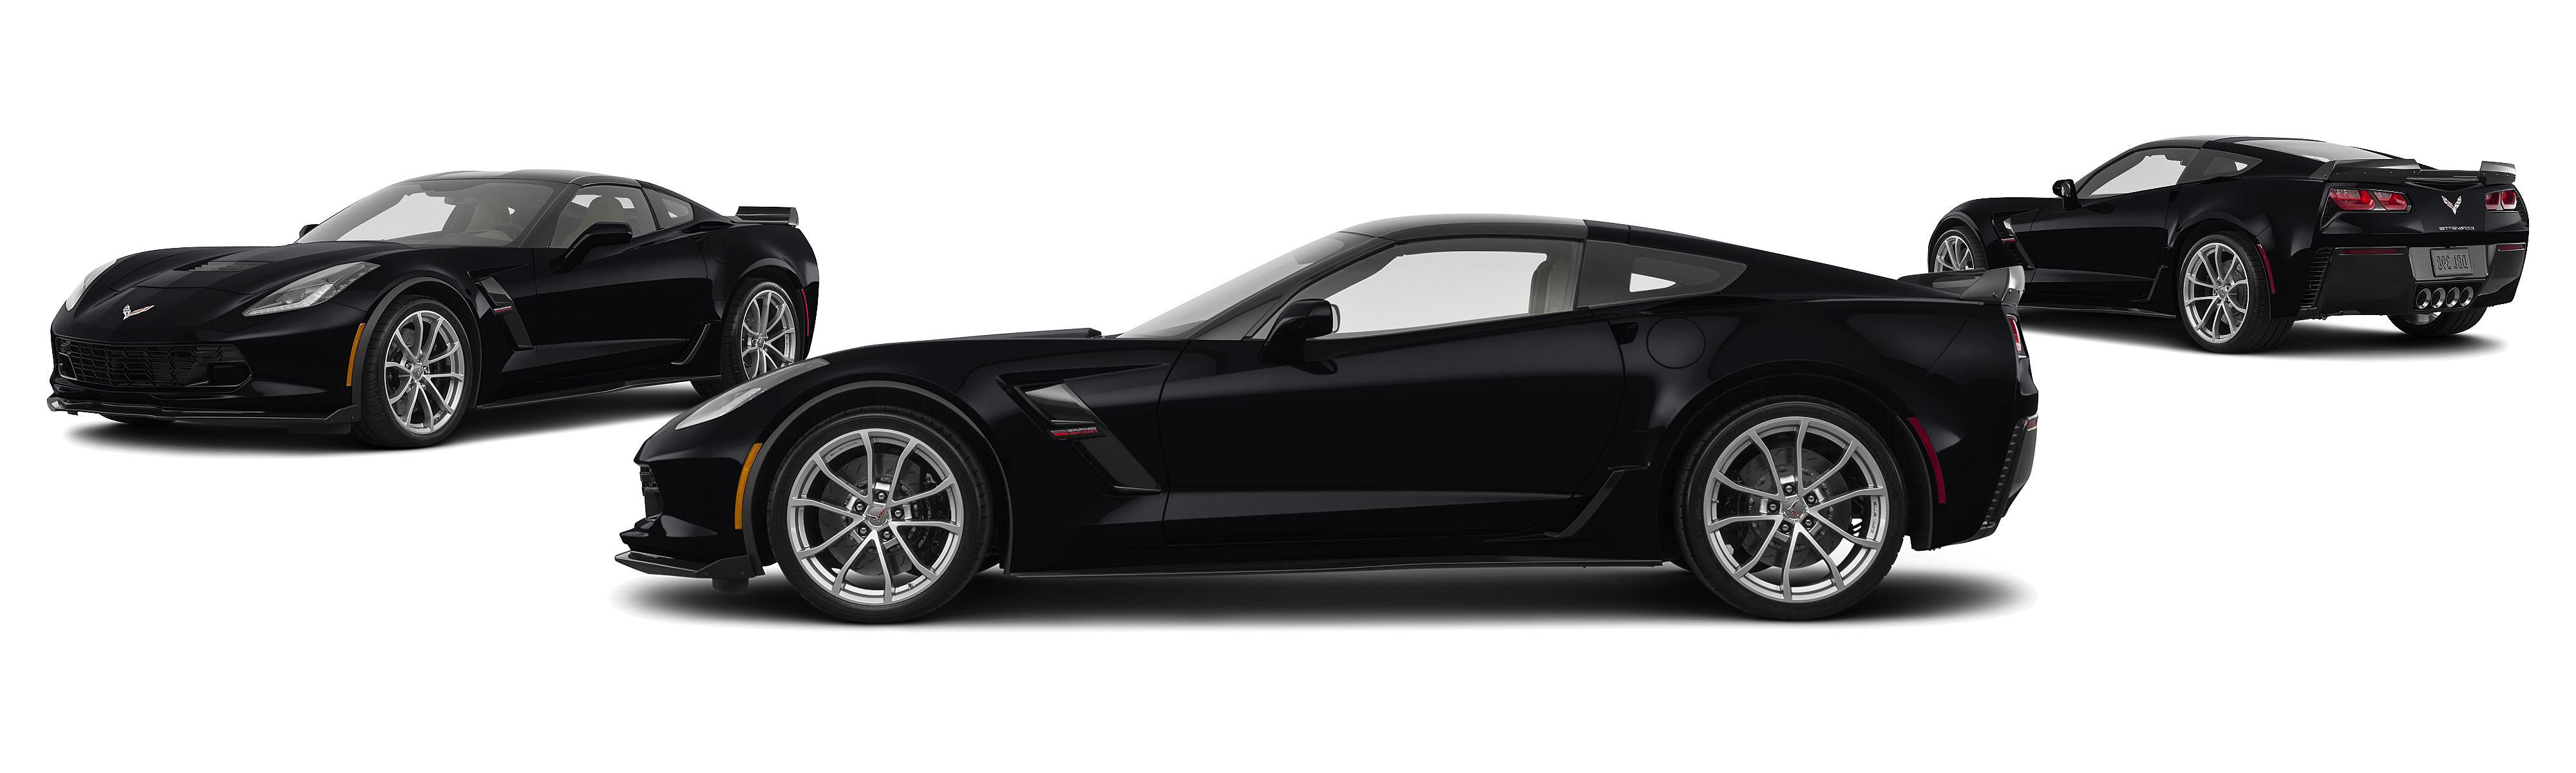 2019 chevrolet corvette grand sport 2dr coupe w 2lt research rh groovecar com